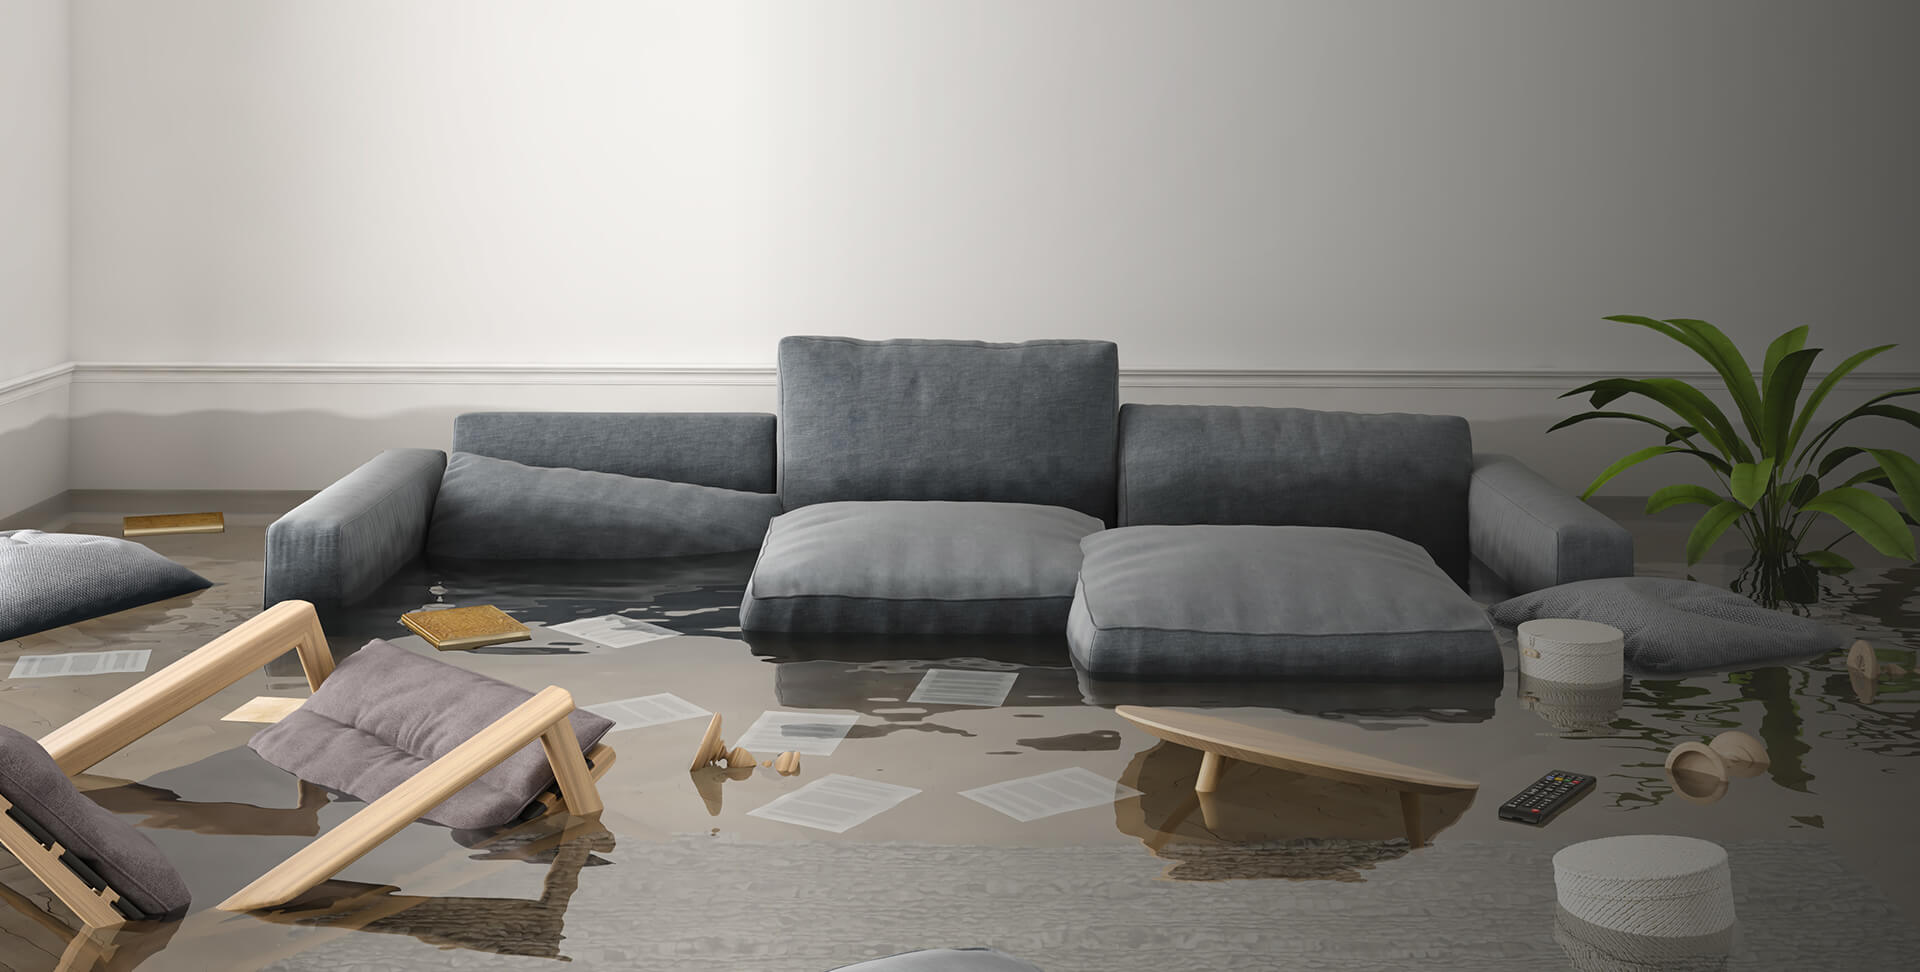 Sonde inondation